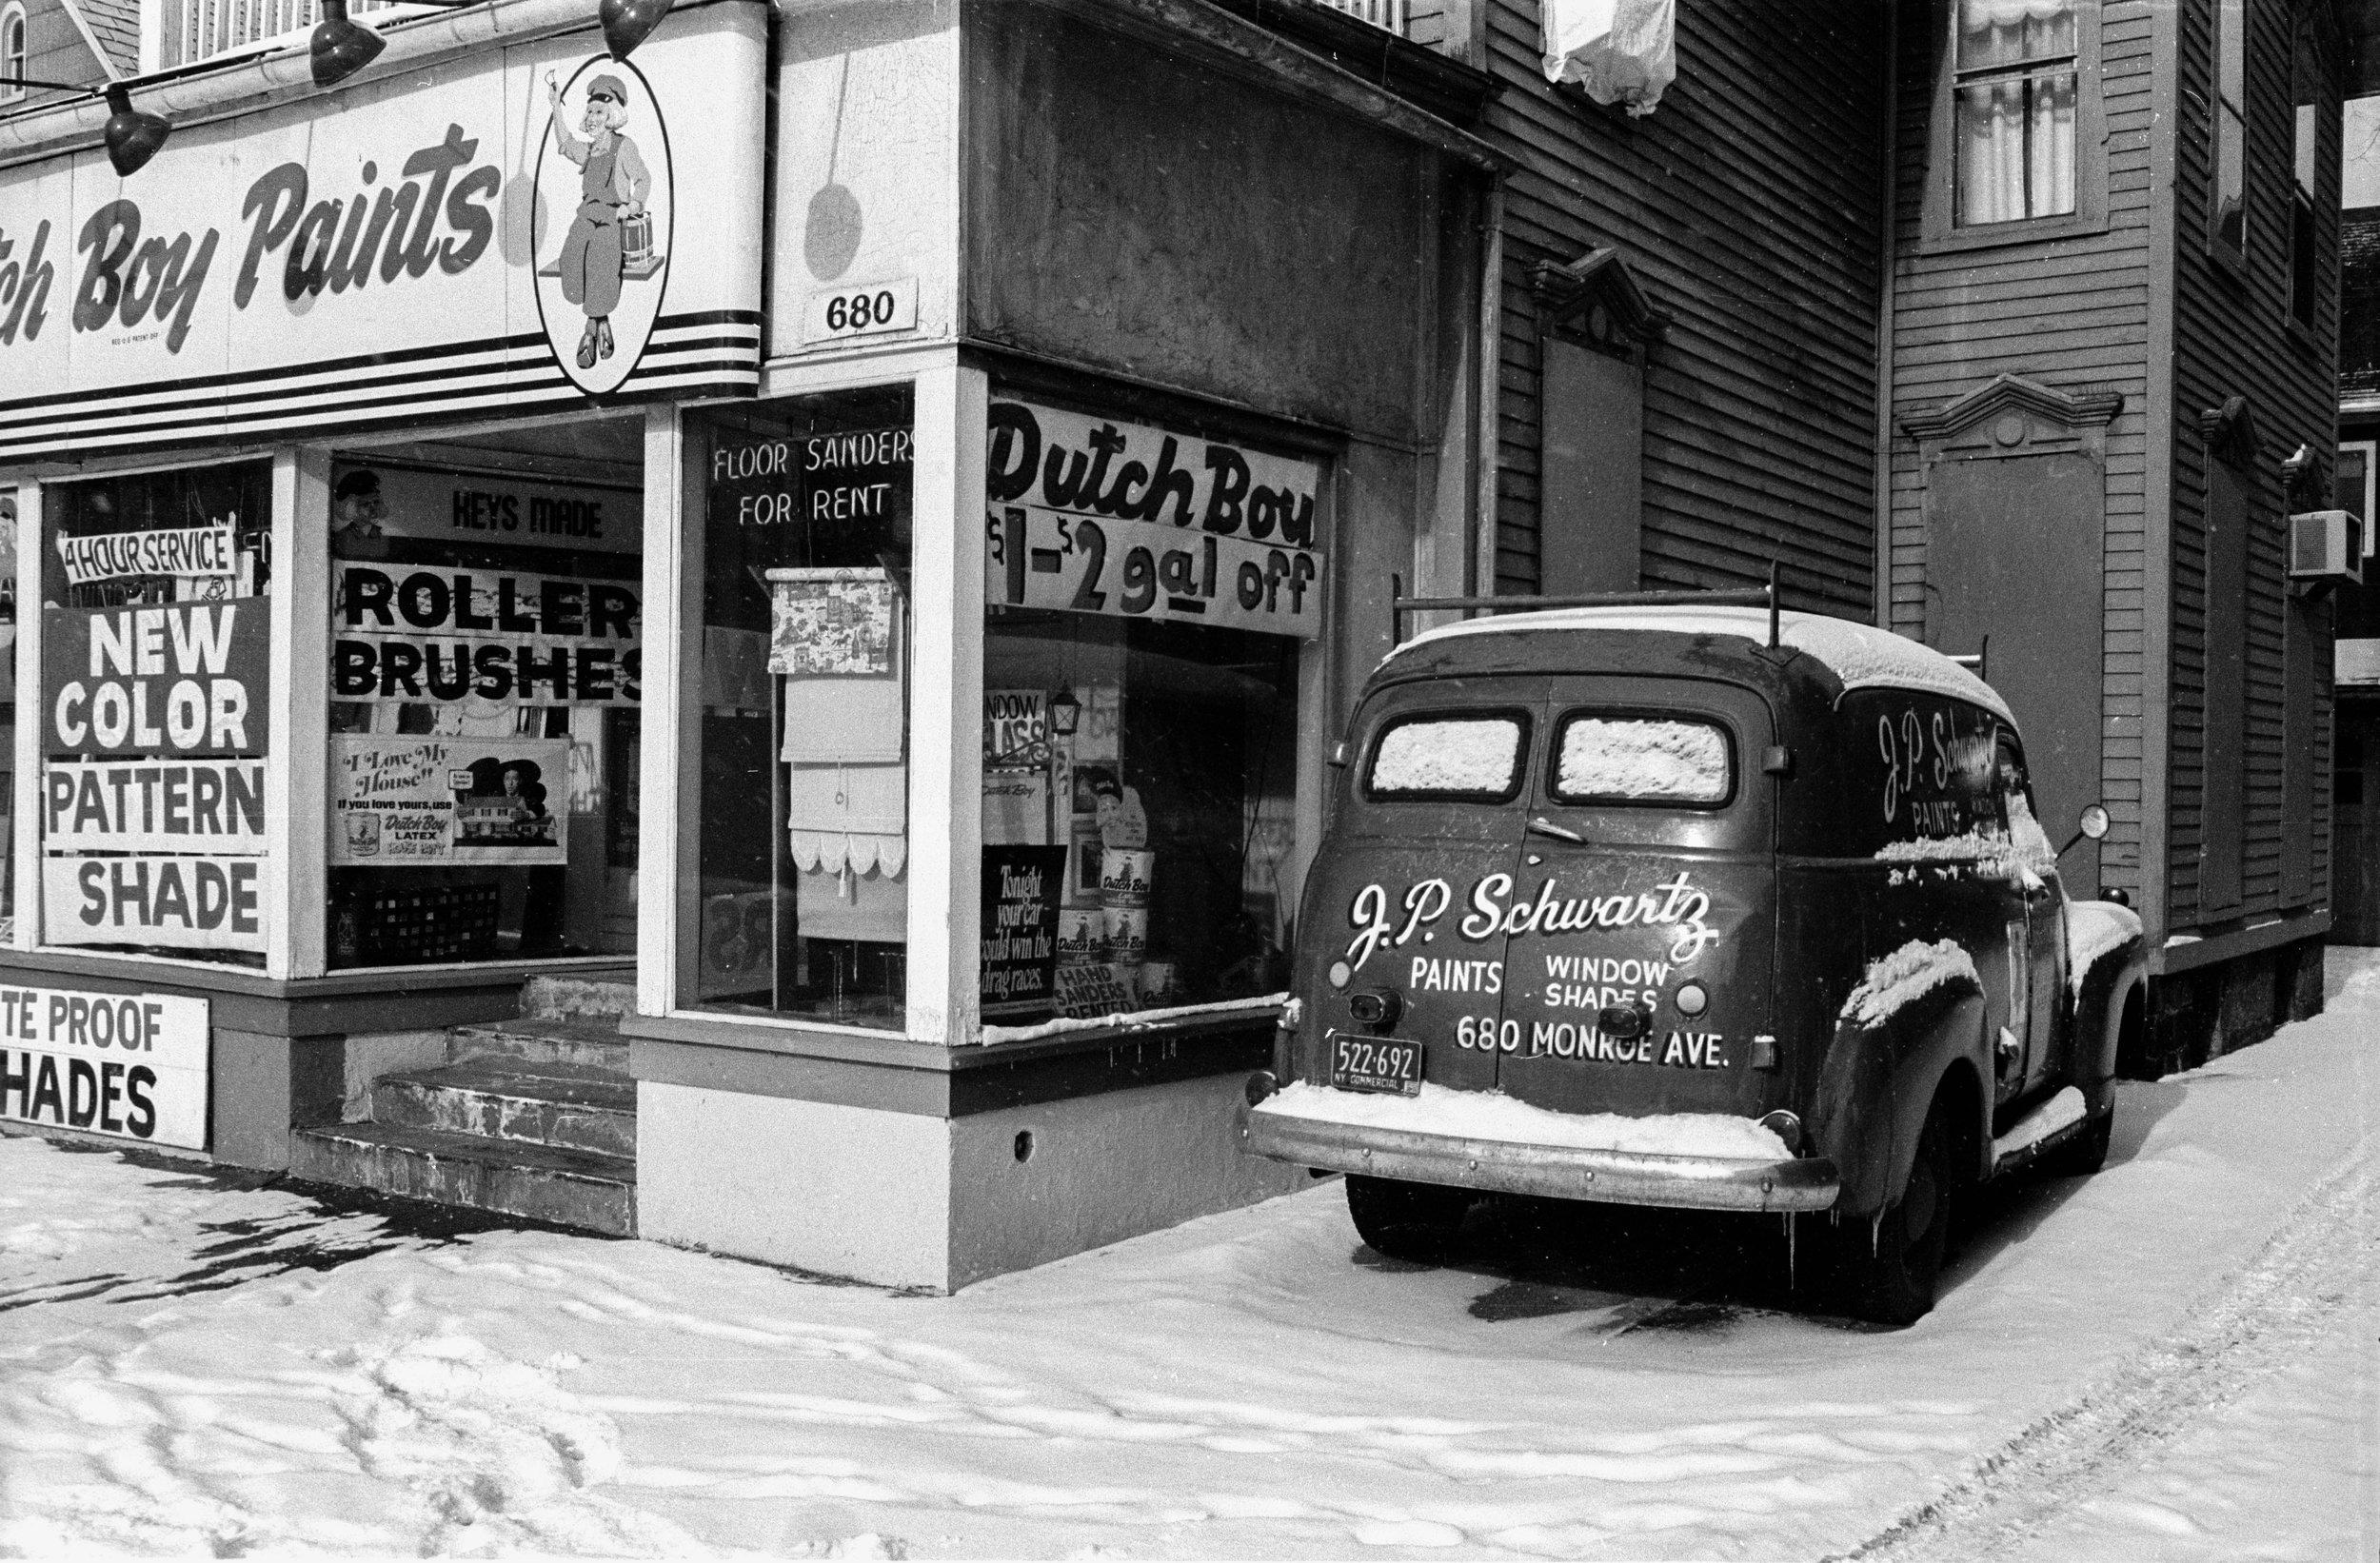 Monroe Avenue, Rochester, 1968